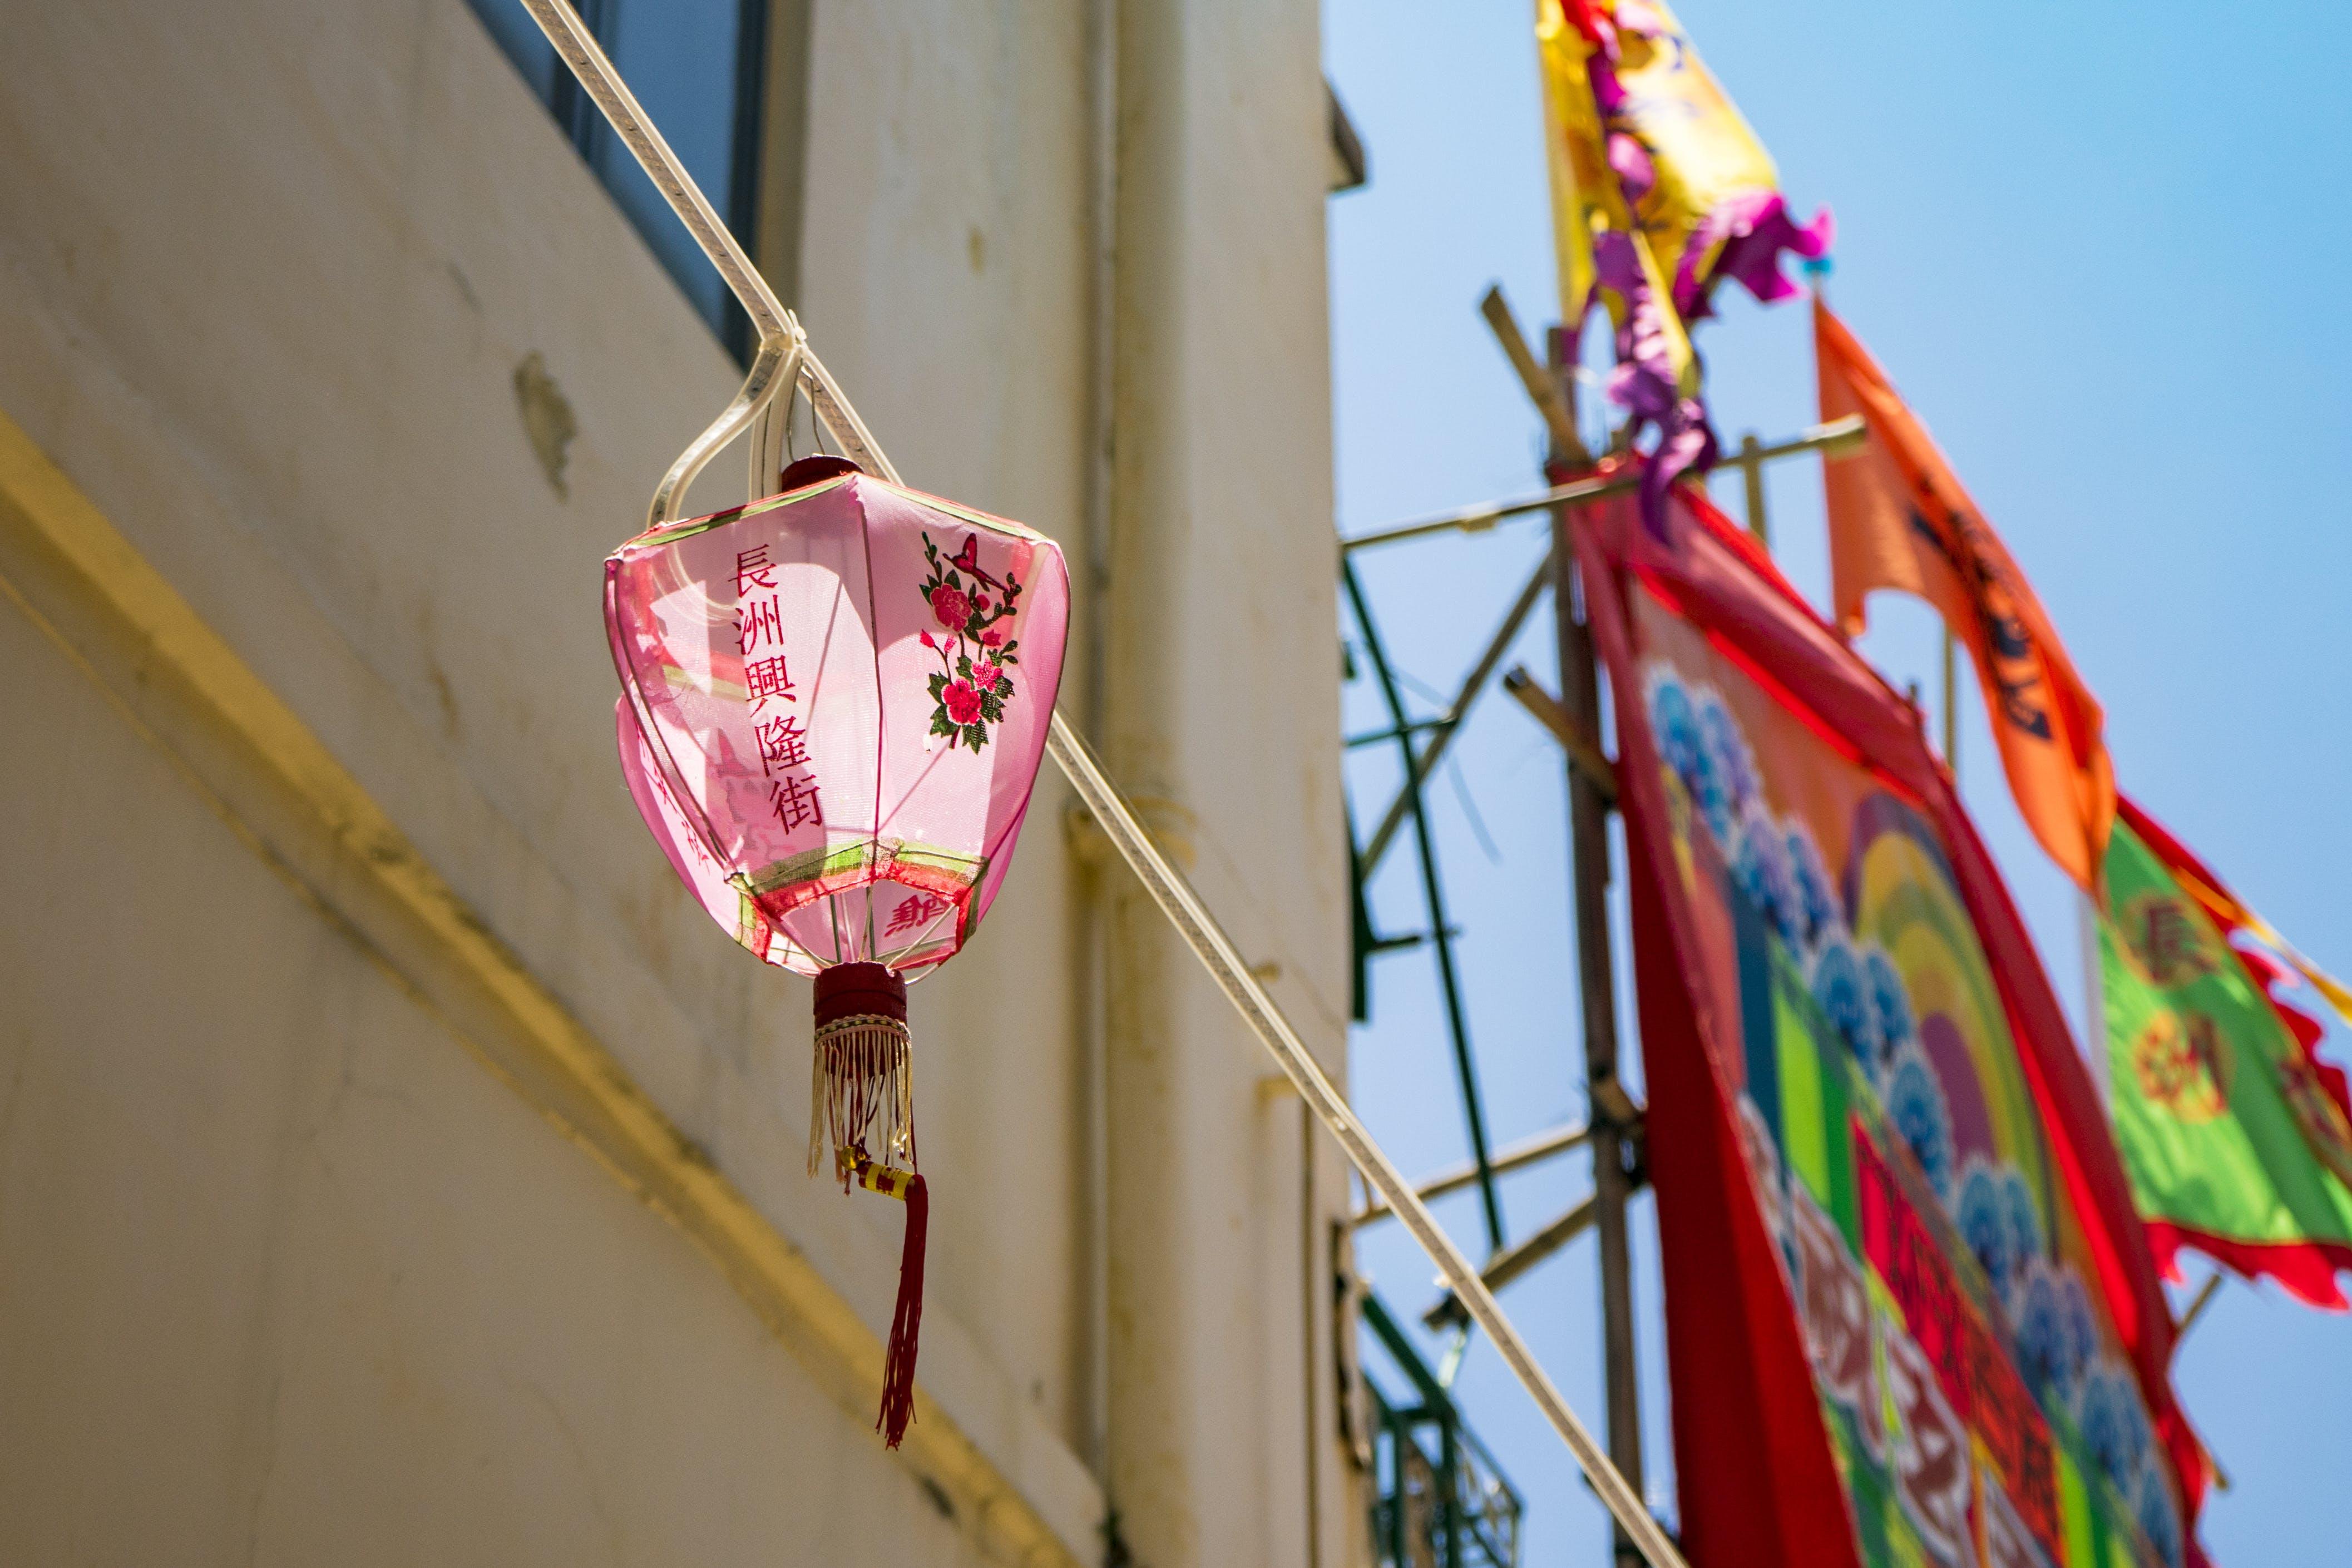 Low Angle Photo of Pink Lantern Decor